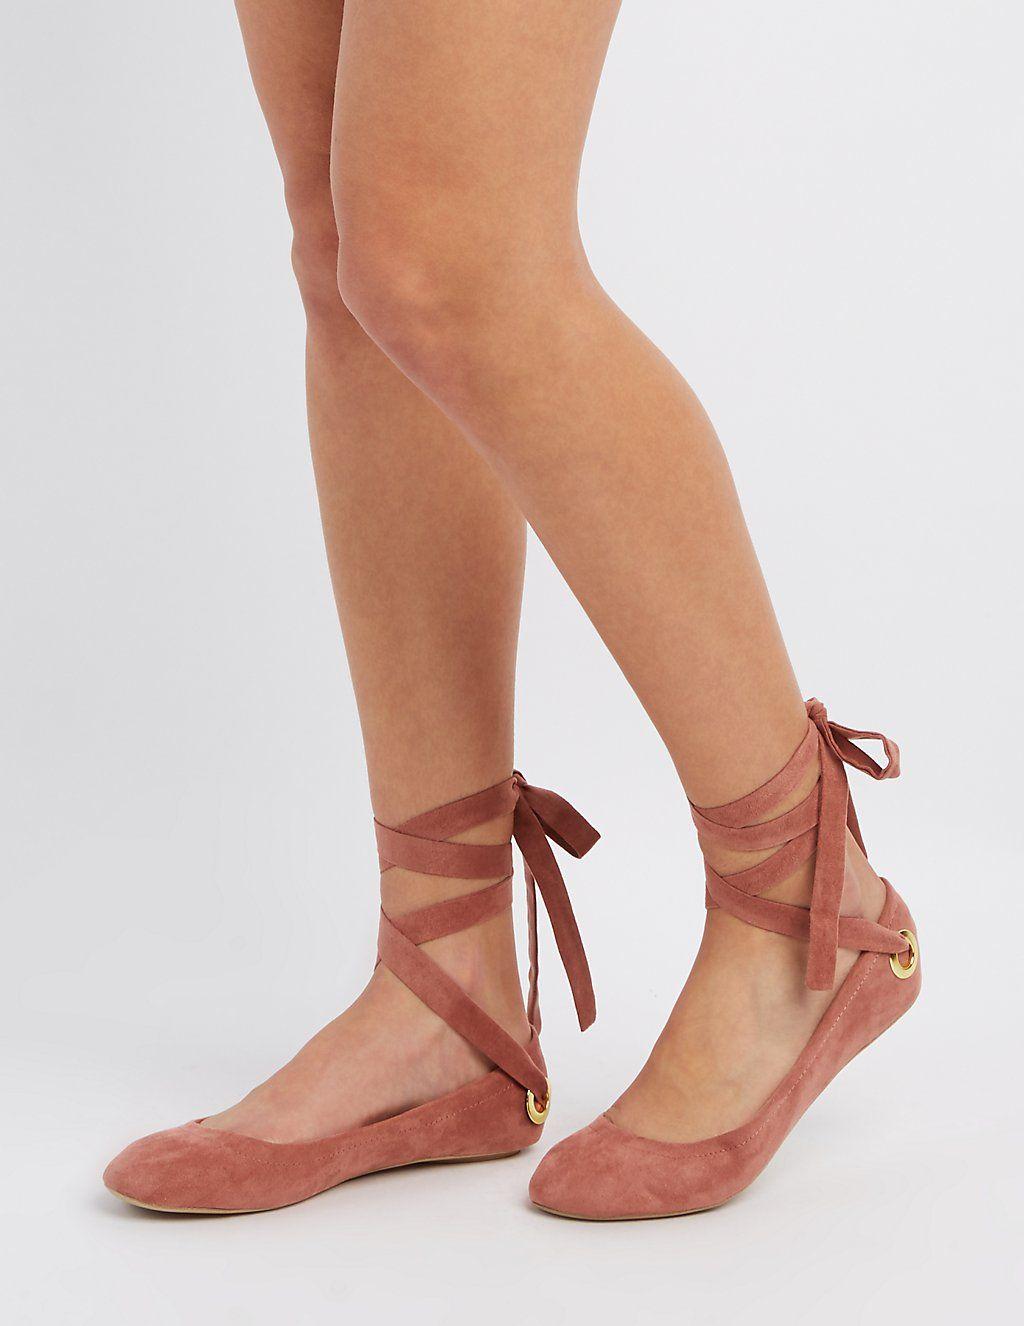 Qupid Women/'s Espadrille Ballerina Ballet Flat